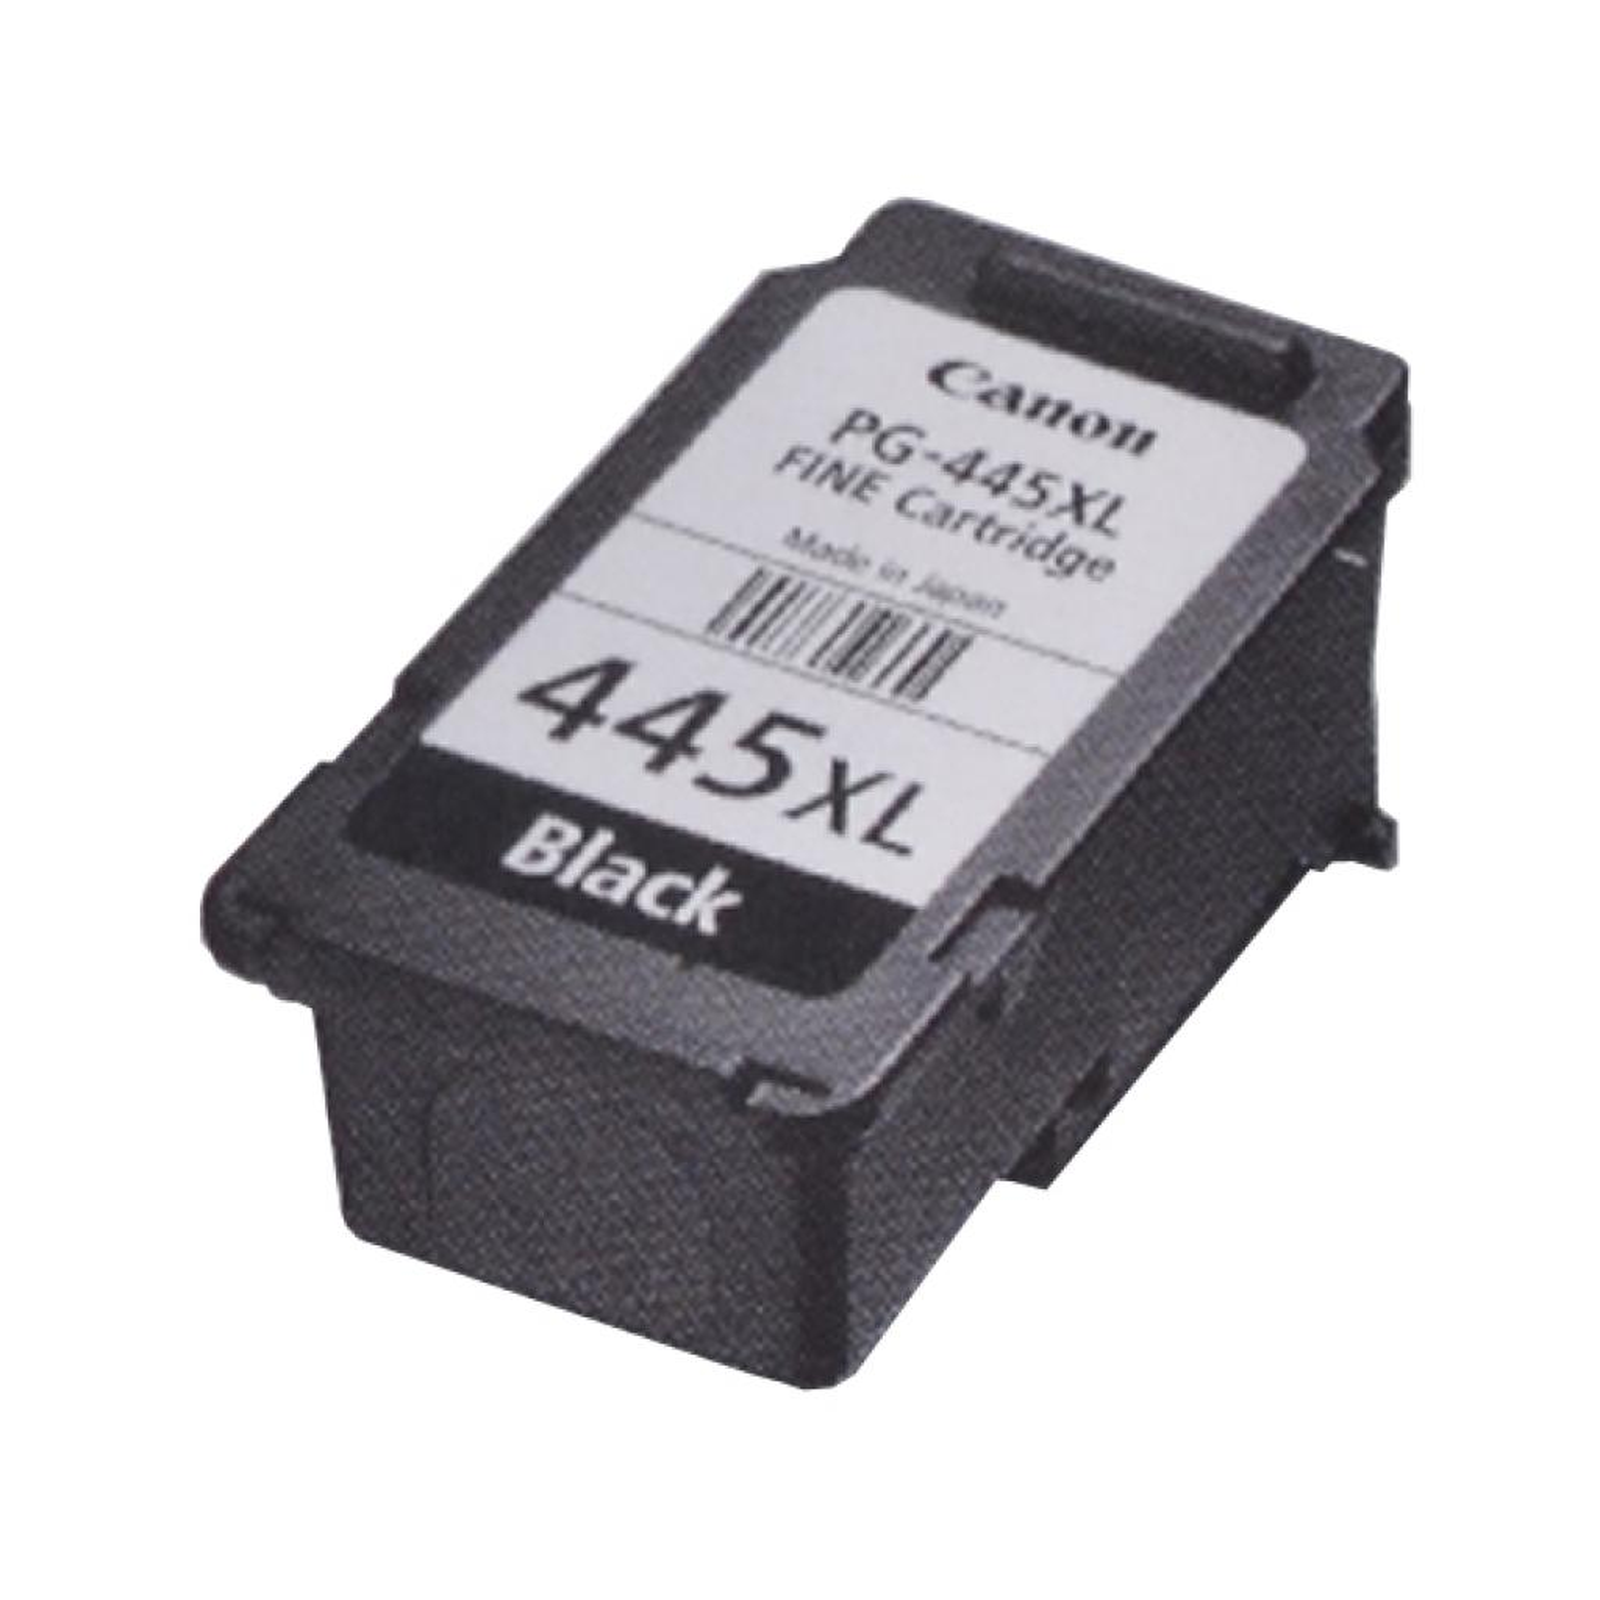 Картридж Canon PG-445XL Black для MG2440 (8282B001) изображение 3